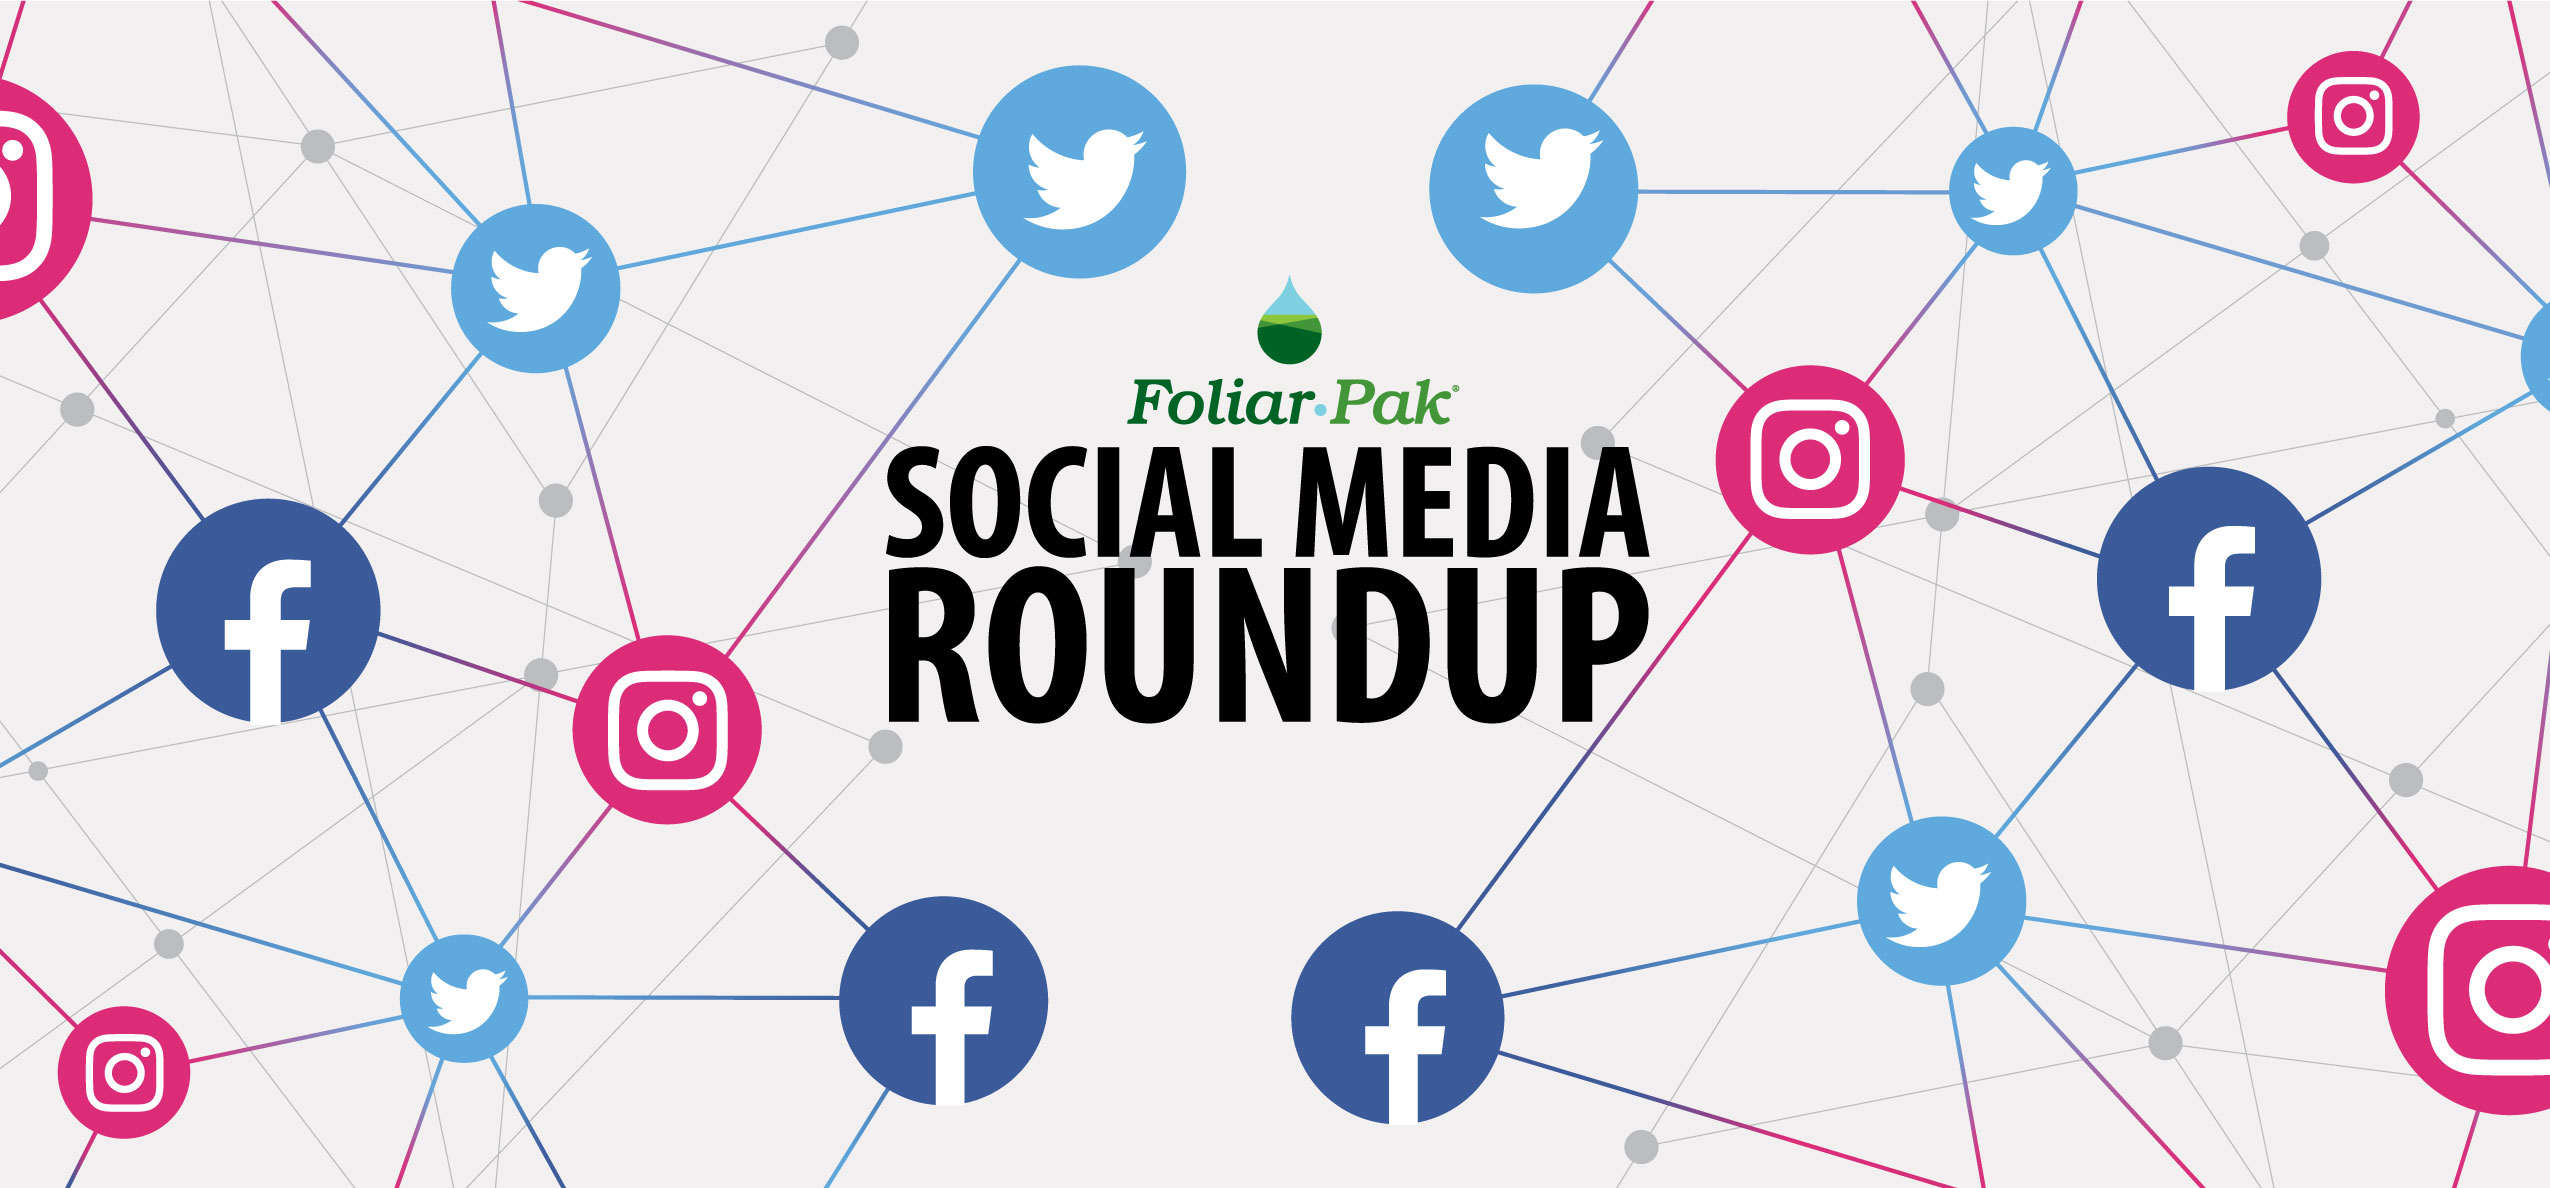 foliar-pak social media roundup